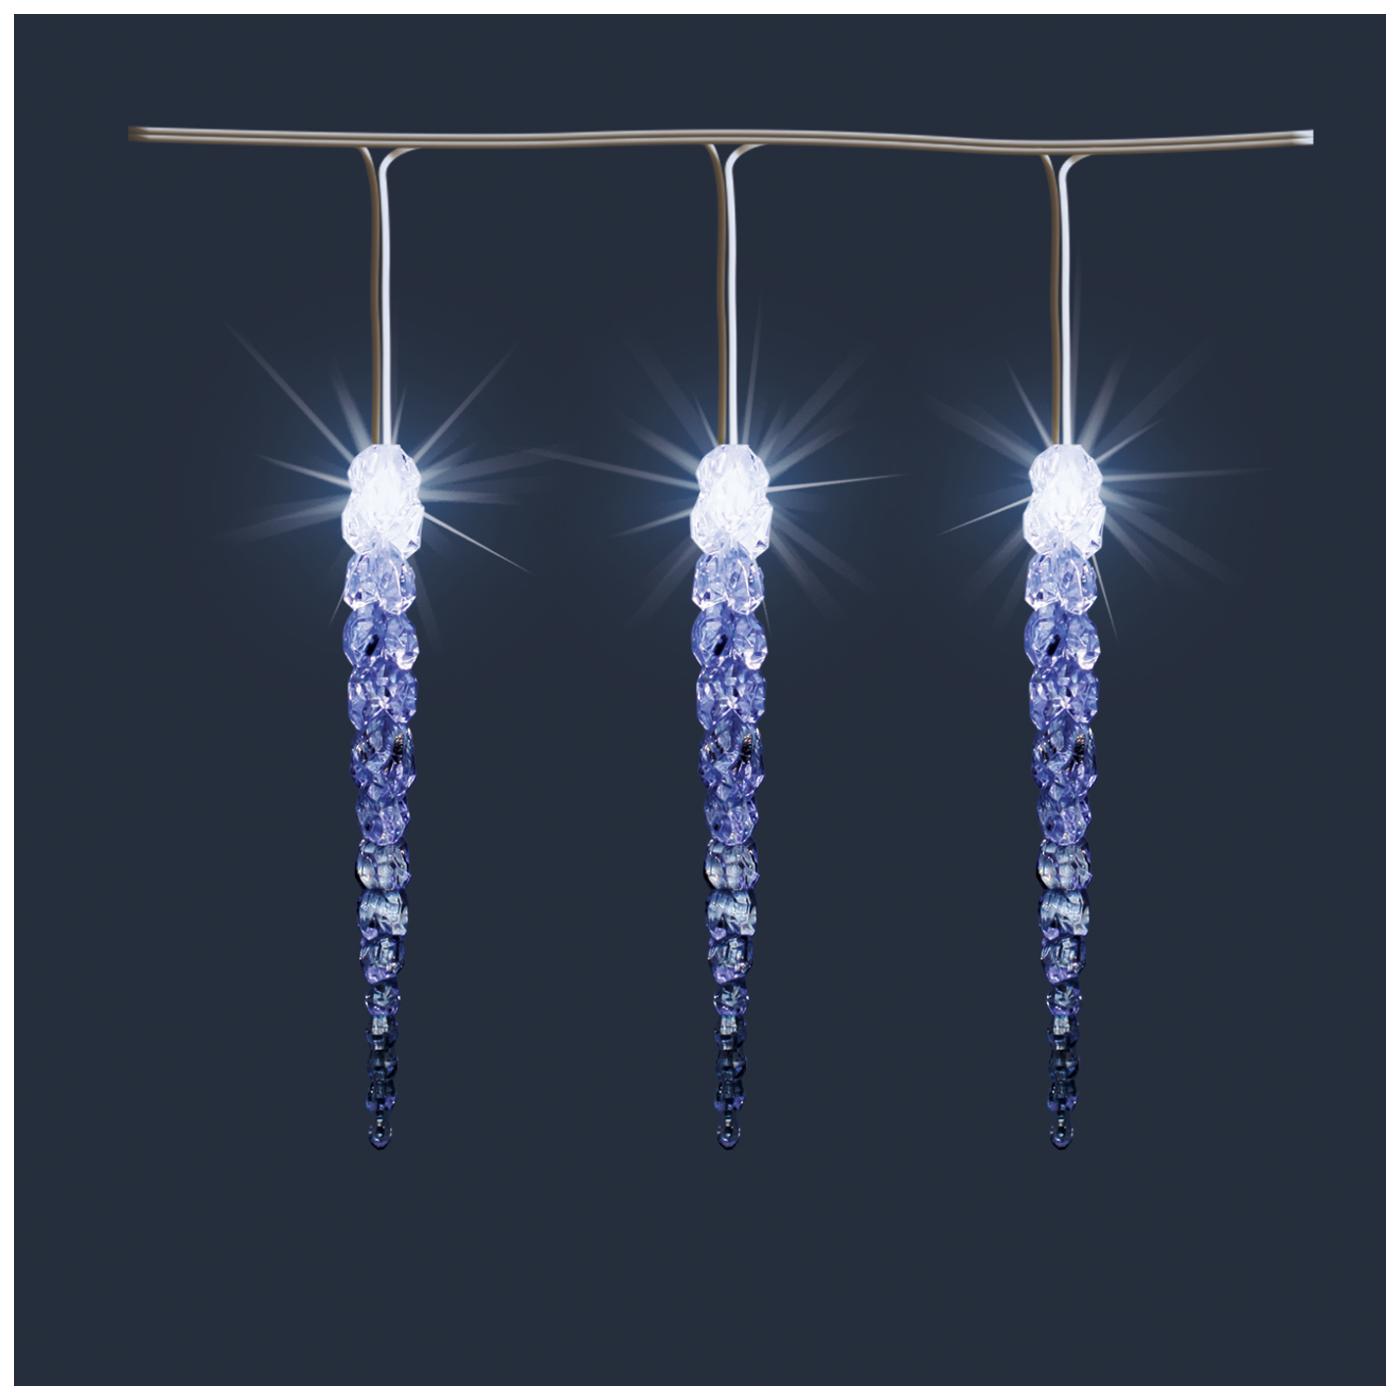 Dekorativna LED rasvjeta, ledenica